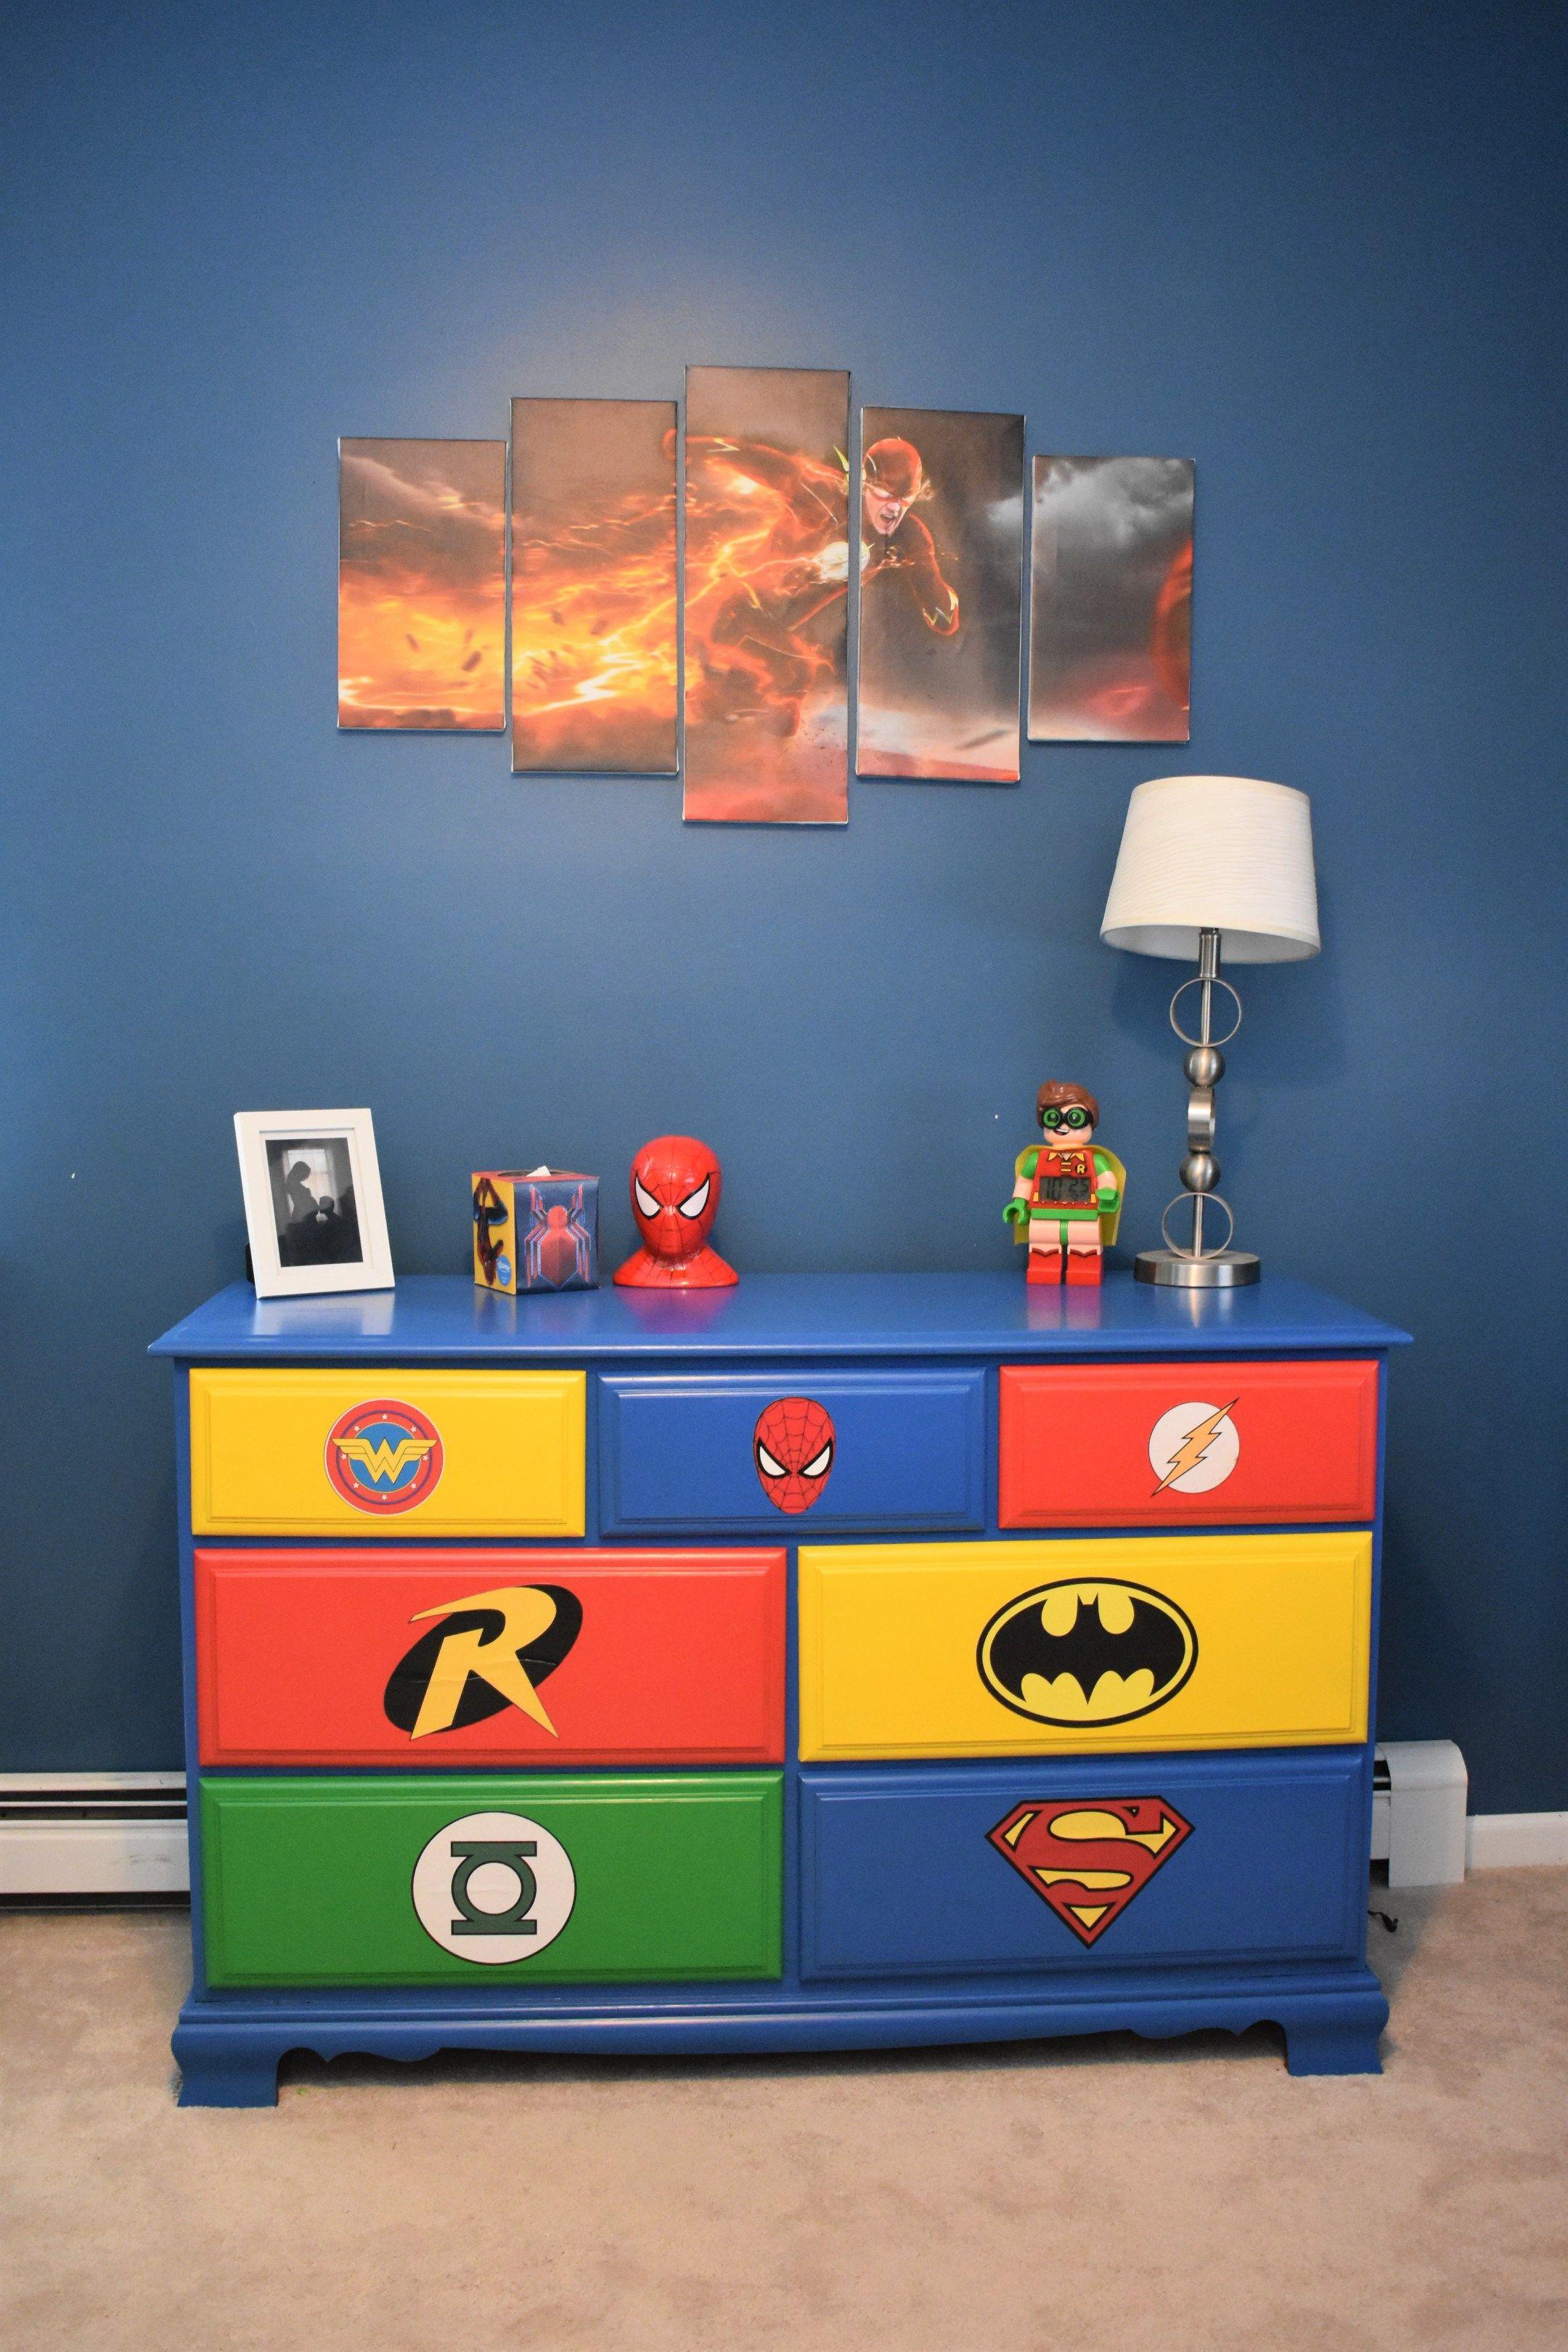 Diy Superhero Room Redeux On A Budget Boy Room Decor Diy Boys Room Diy Superhero Room Diy